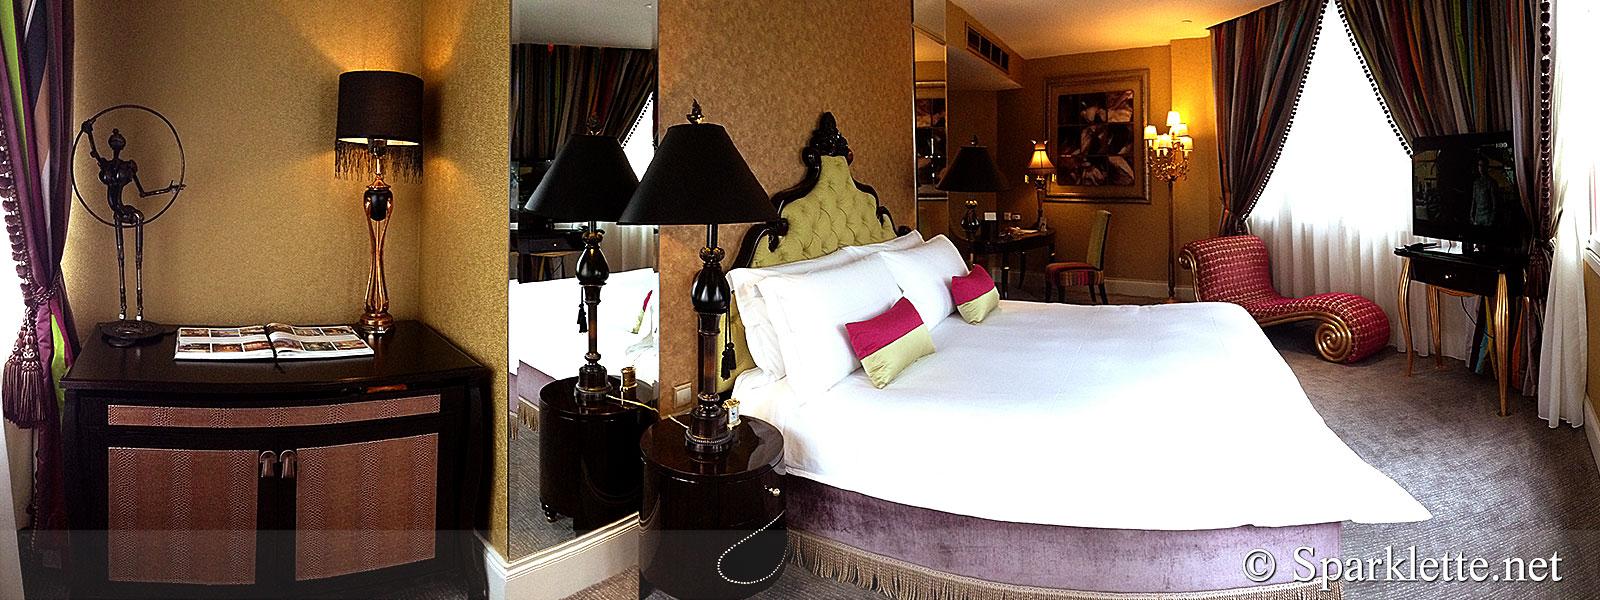 The Scarlet Hotel Splendour Suite Panorama